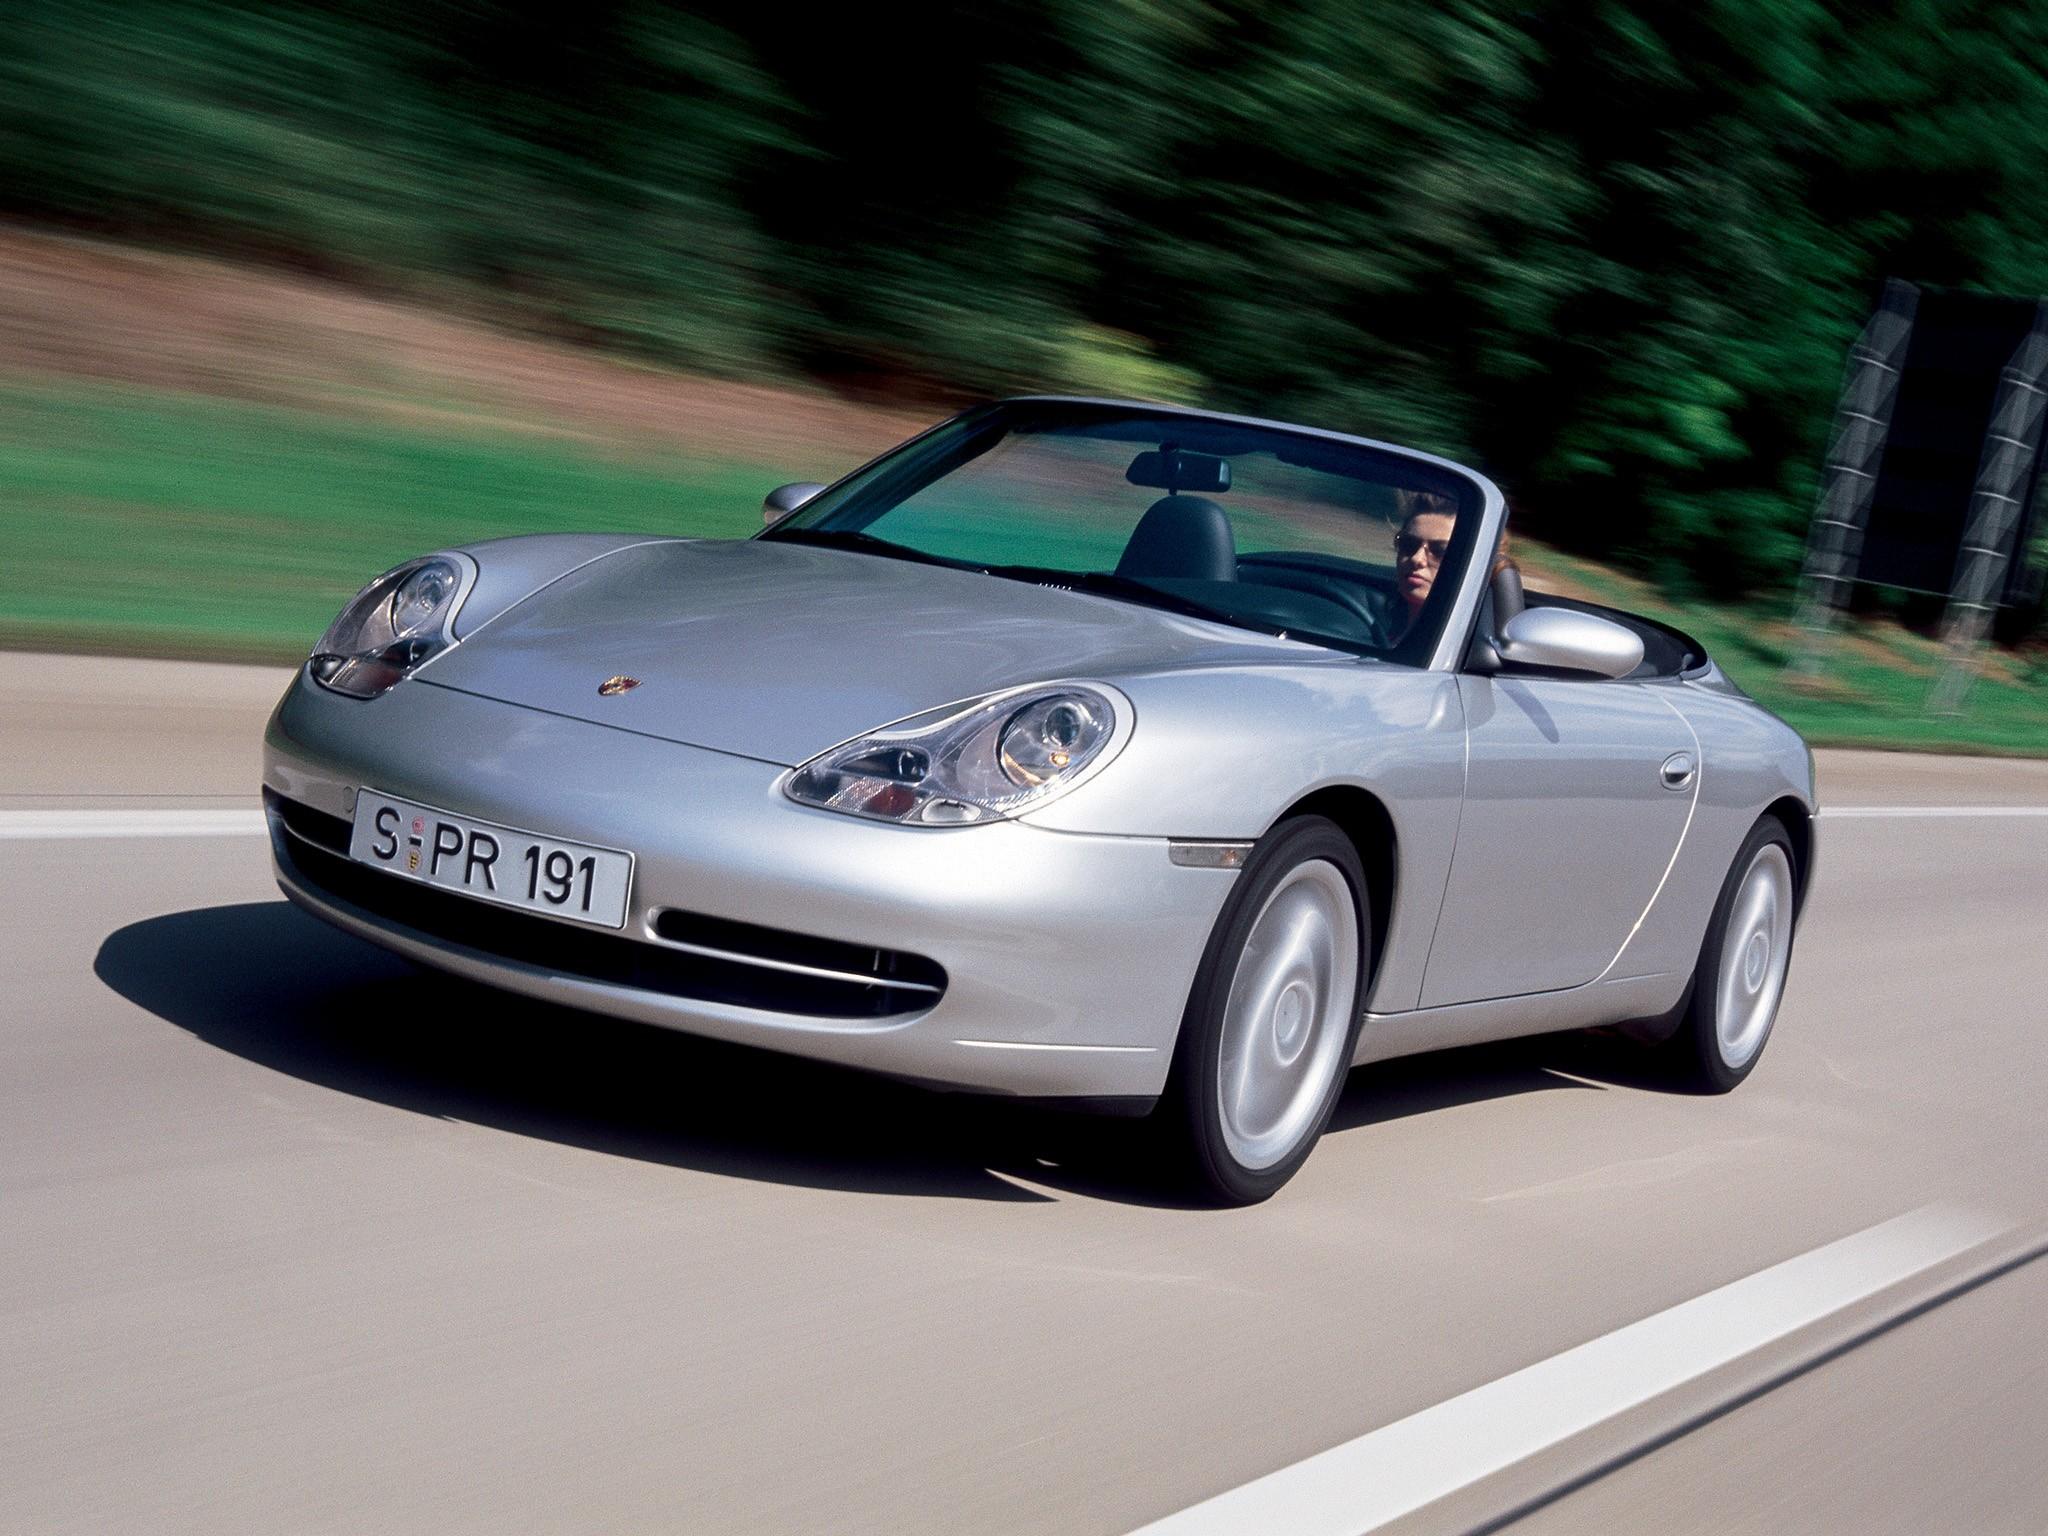 porsche 911 carrera 4 cabriolet 996 specs photos 1998 1999 2000 2001 autoevolution. Black Bedroom Furniture Sets. Home Design Ideas